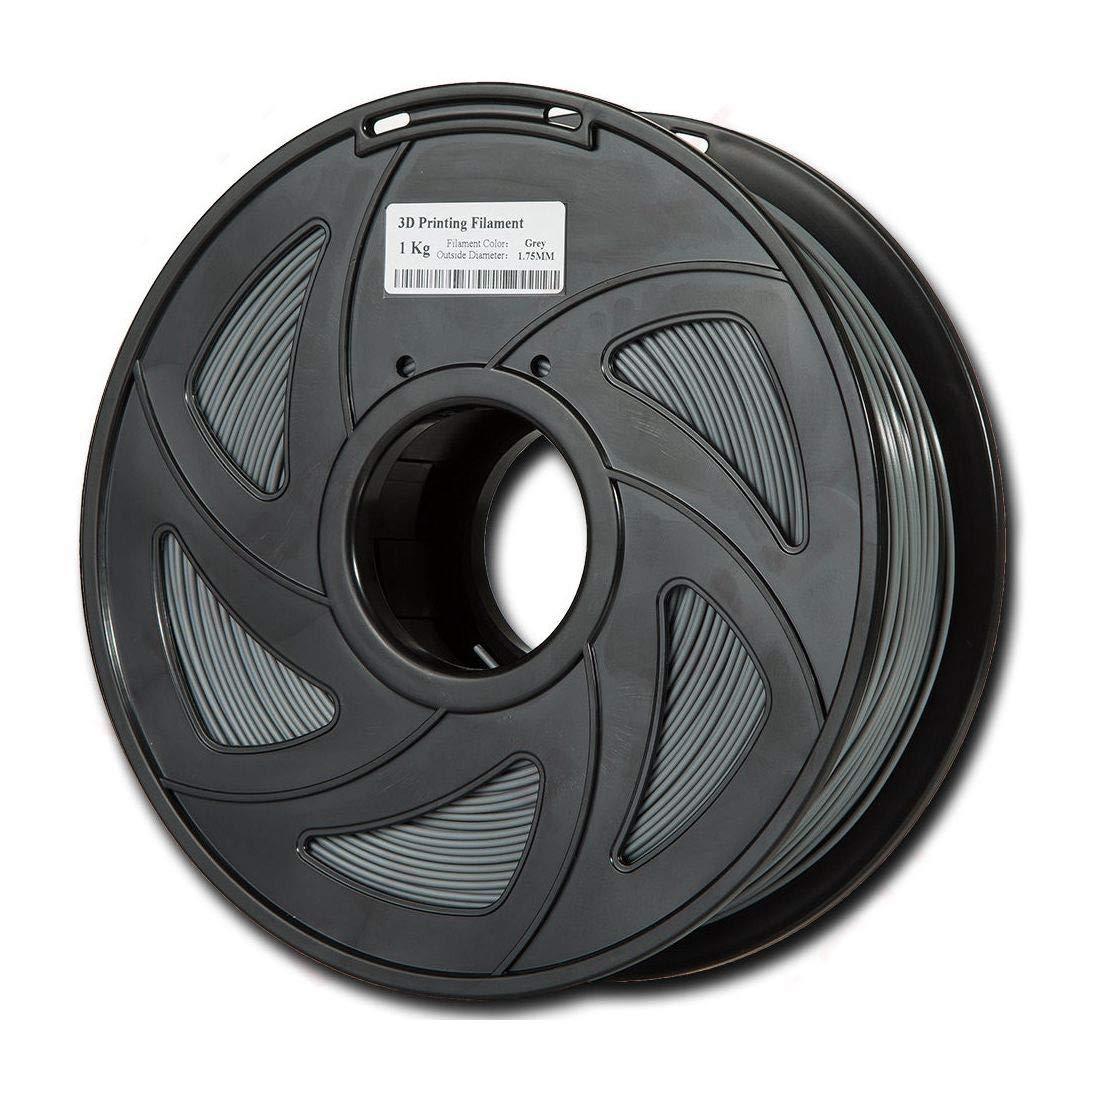 FAN-MING-N-3D, filamento de impresión de 1 kg de Impresora 3D, 1 ...